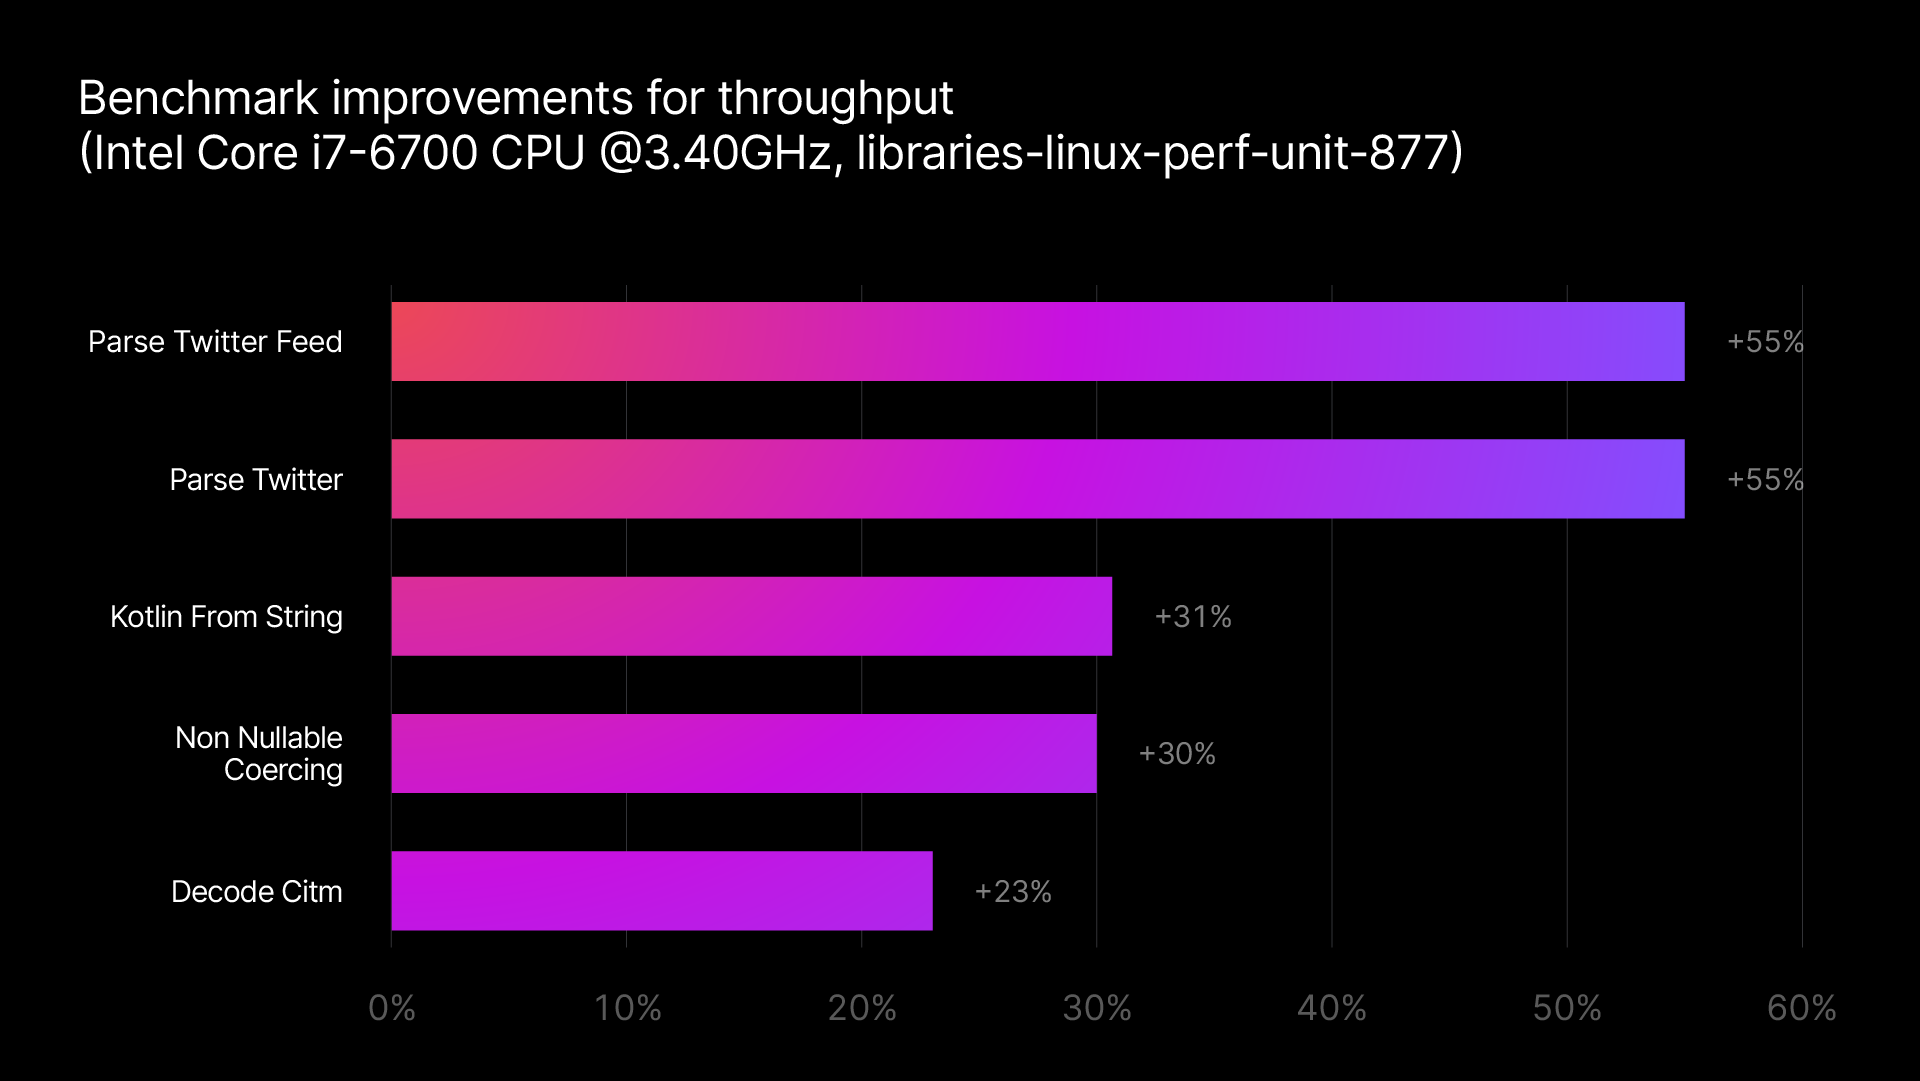 kotlinx.serialization を使った JSON の解析: 最高で 55% もスピードアップ